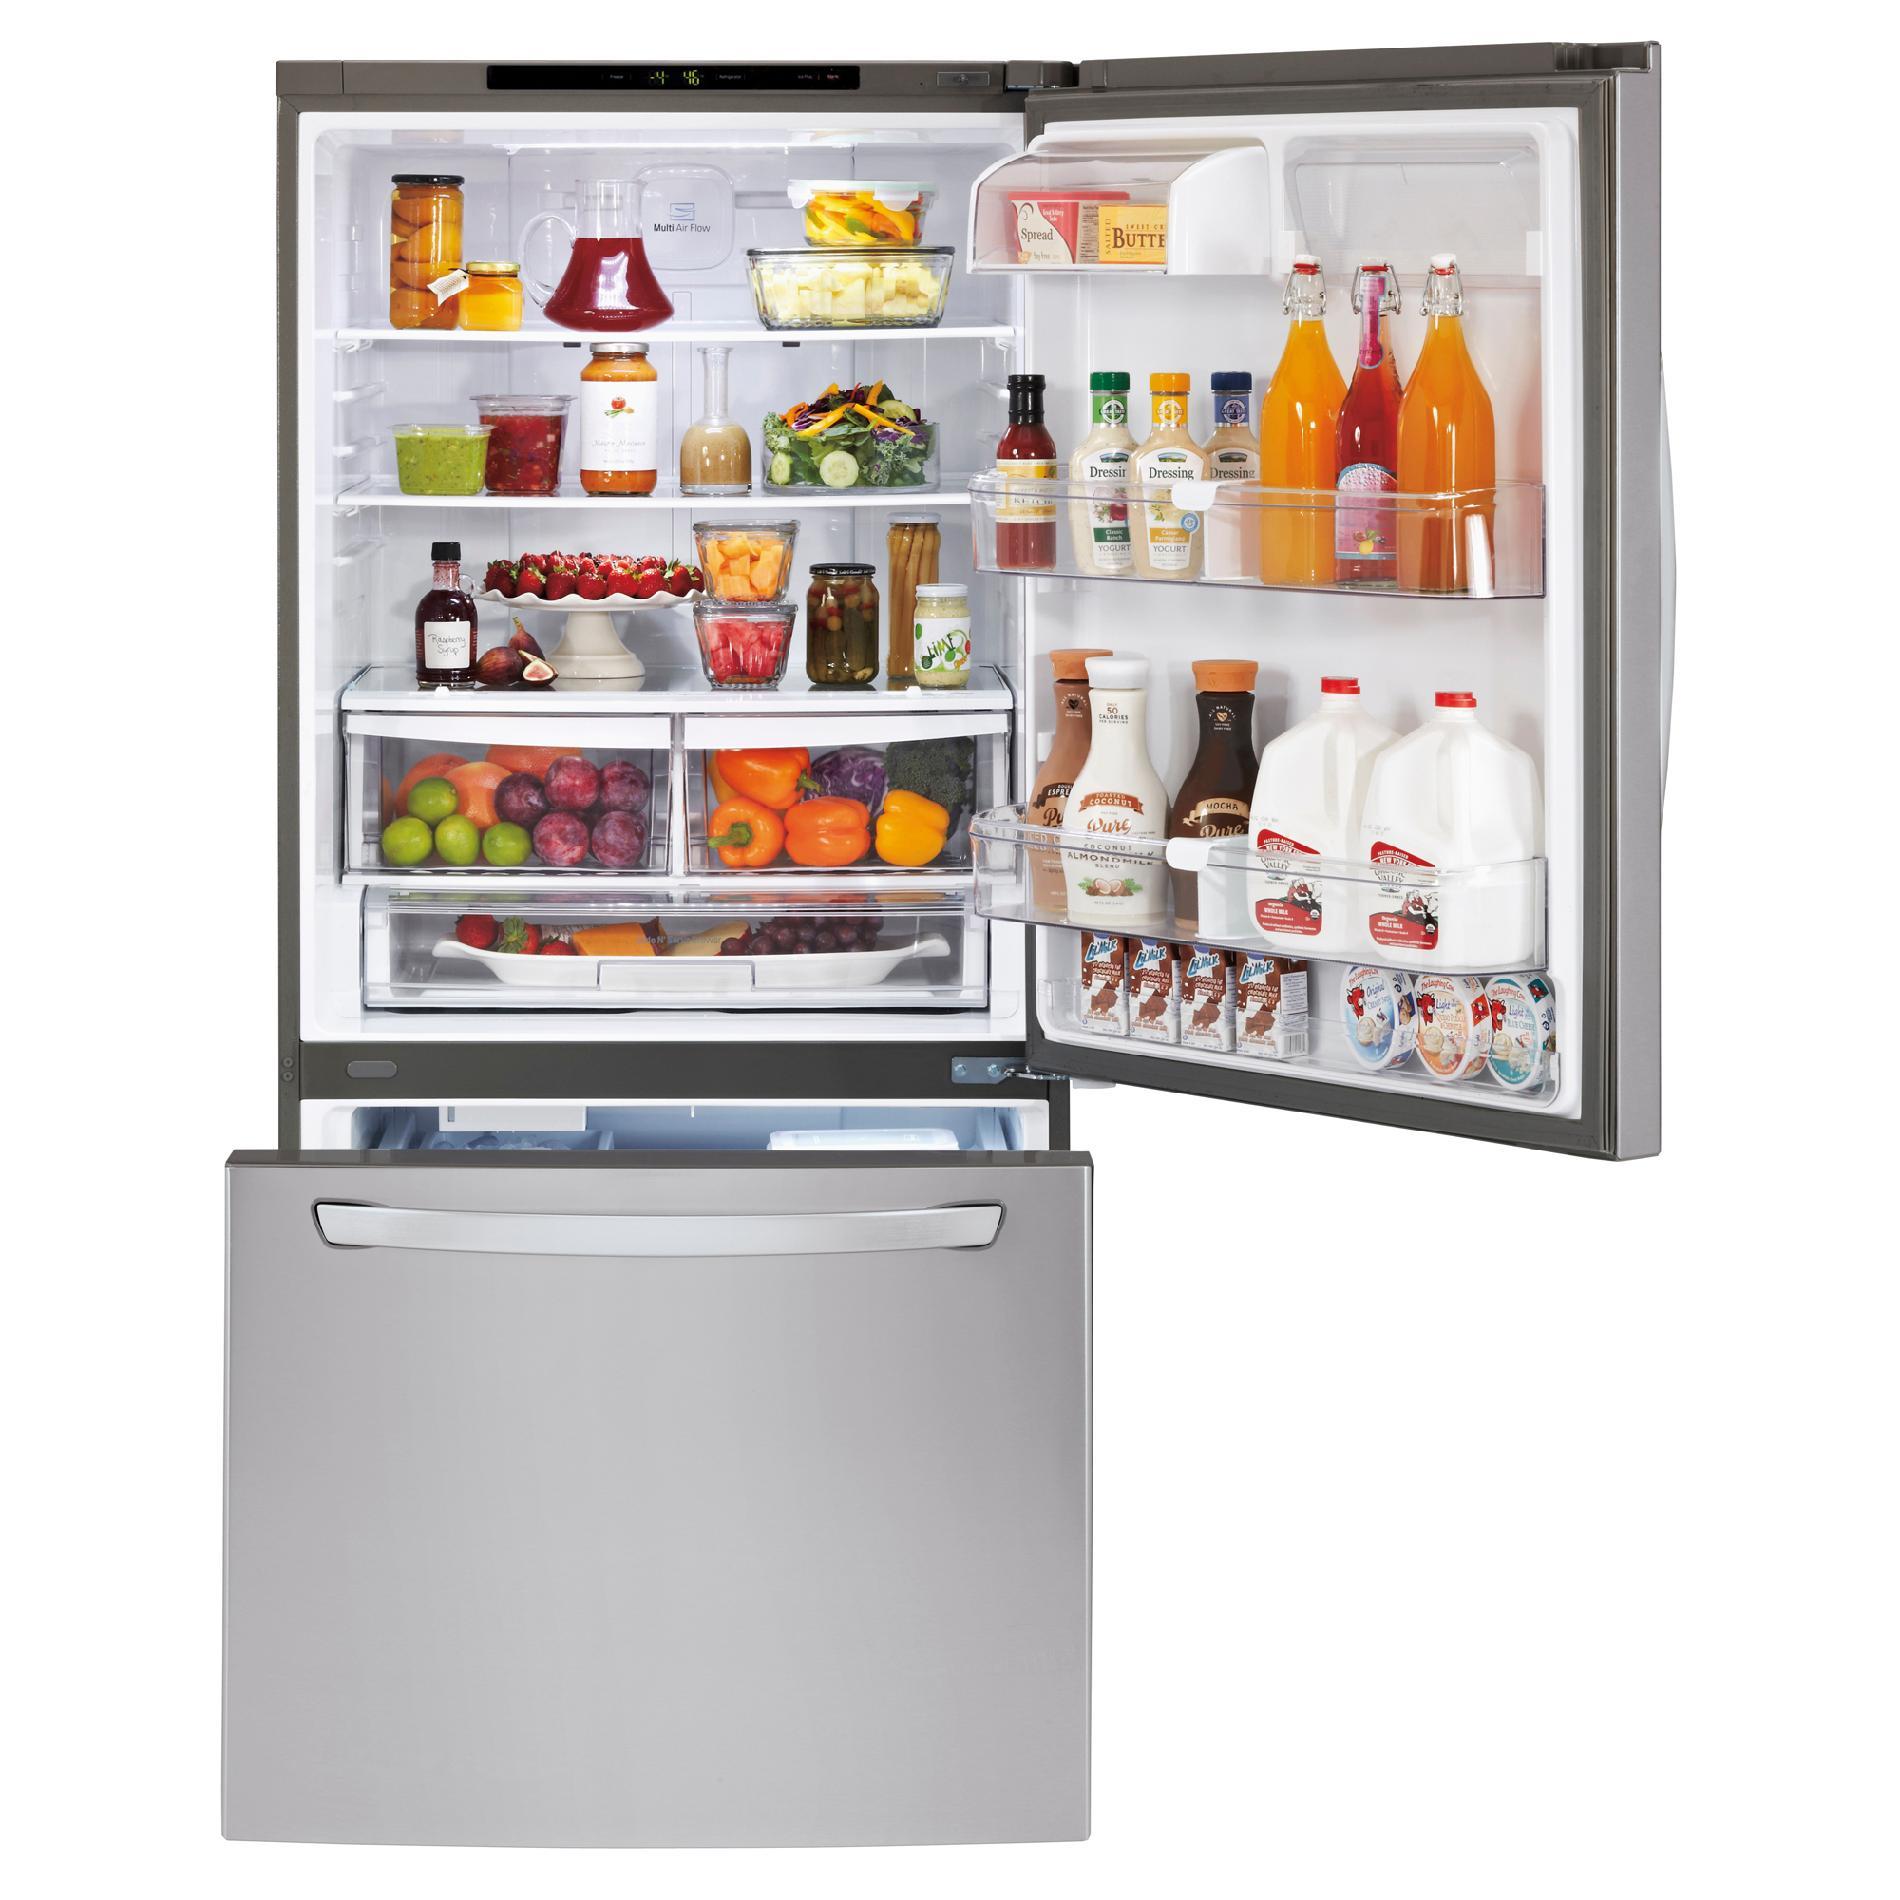 LG LDC24370ST 24 Cu. Ft. Stainless Bottom-Freezer Refrigerator